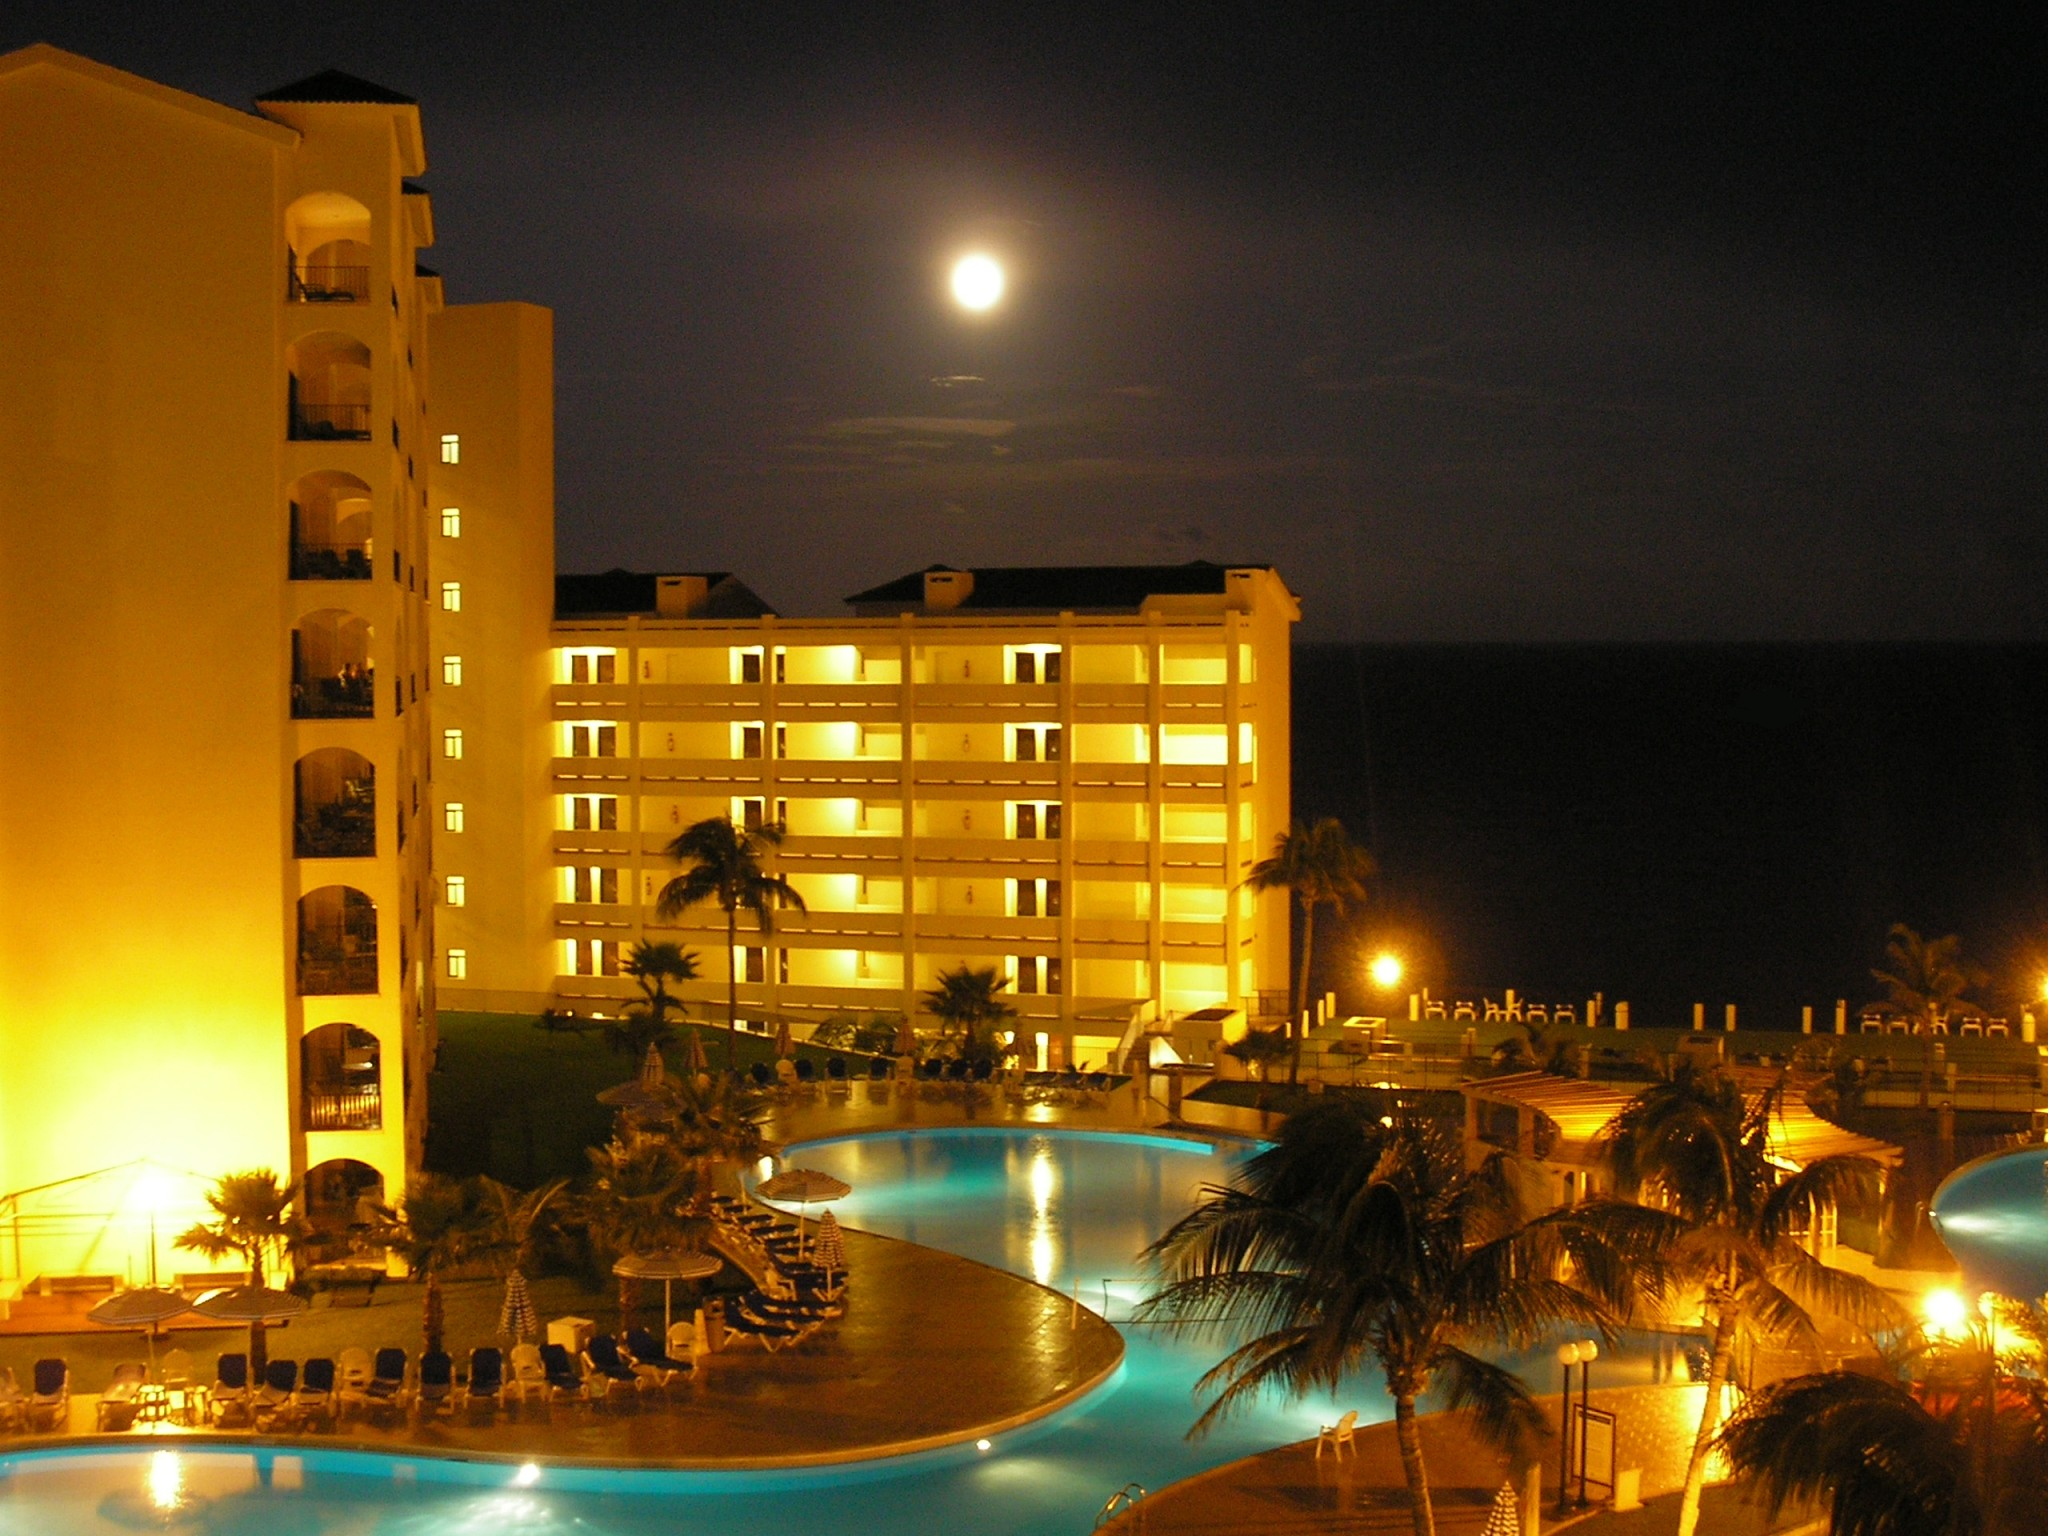 Moon over Royal Caribbean Hotel